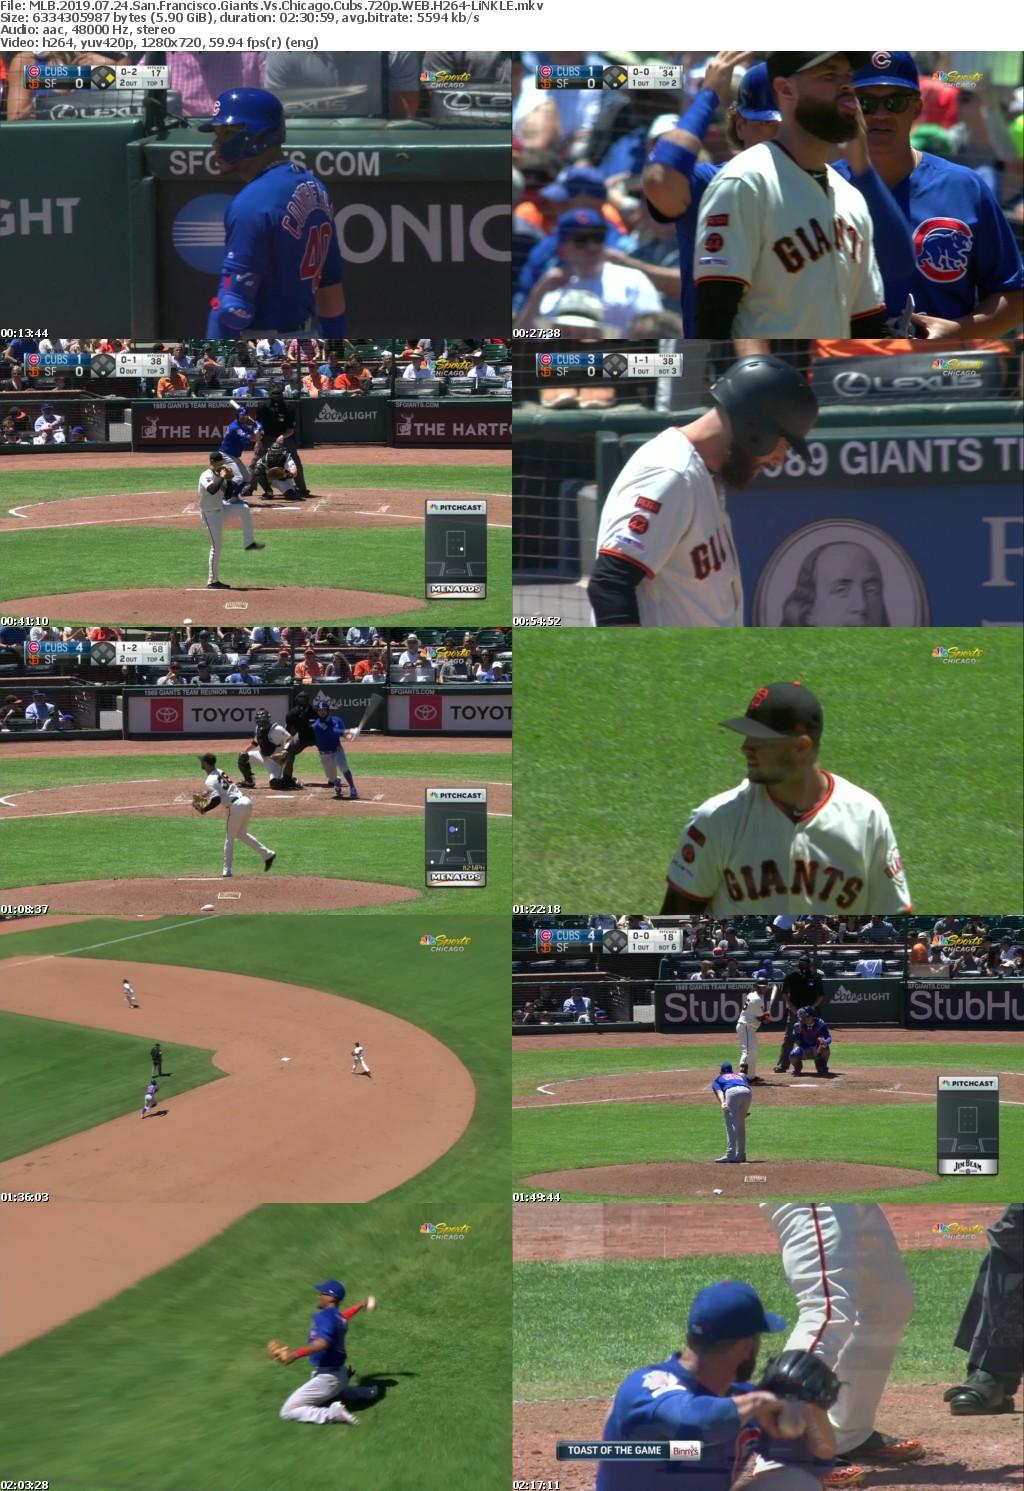 MLB 2019 07 24 San Francisco Giants Vs Chicago Cubs 720p WEB H264-LiNKLE